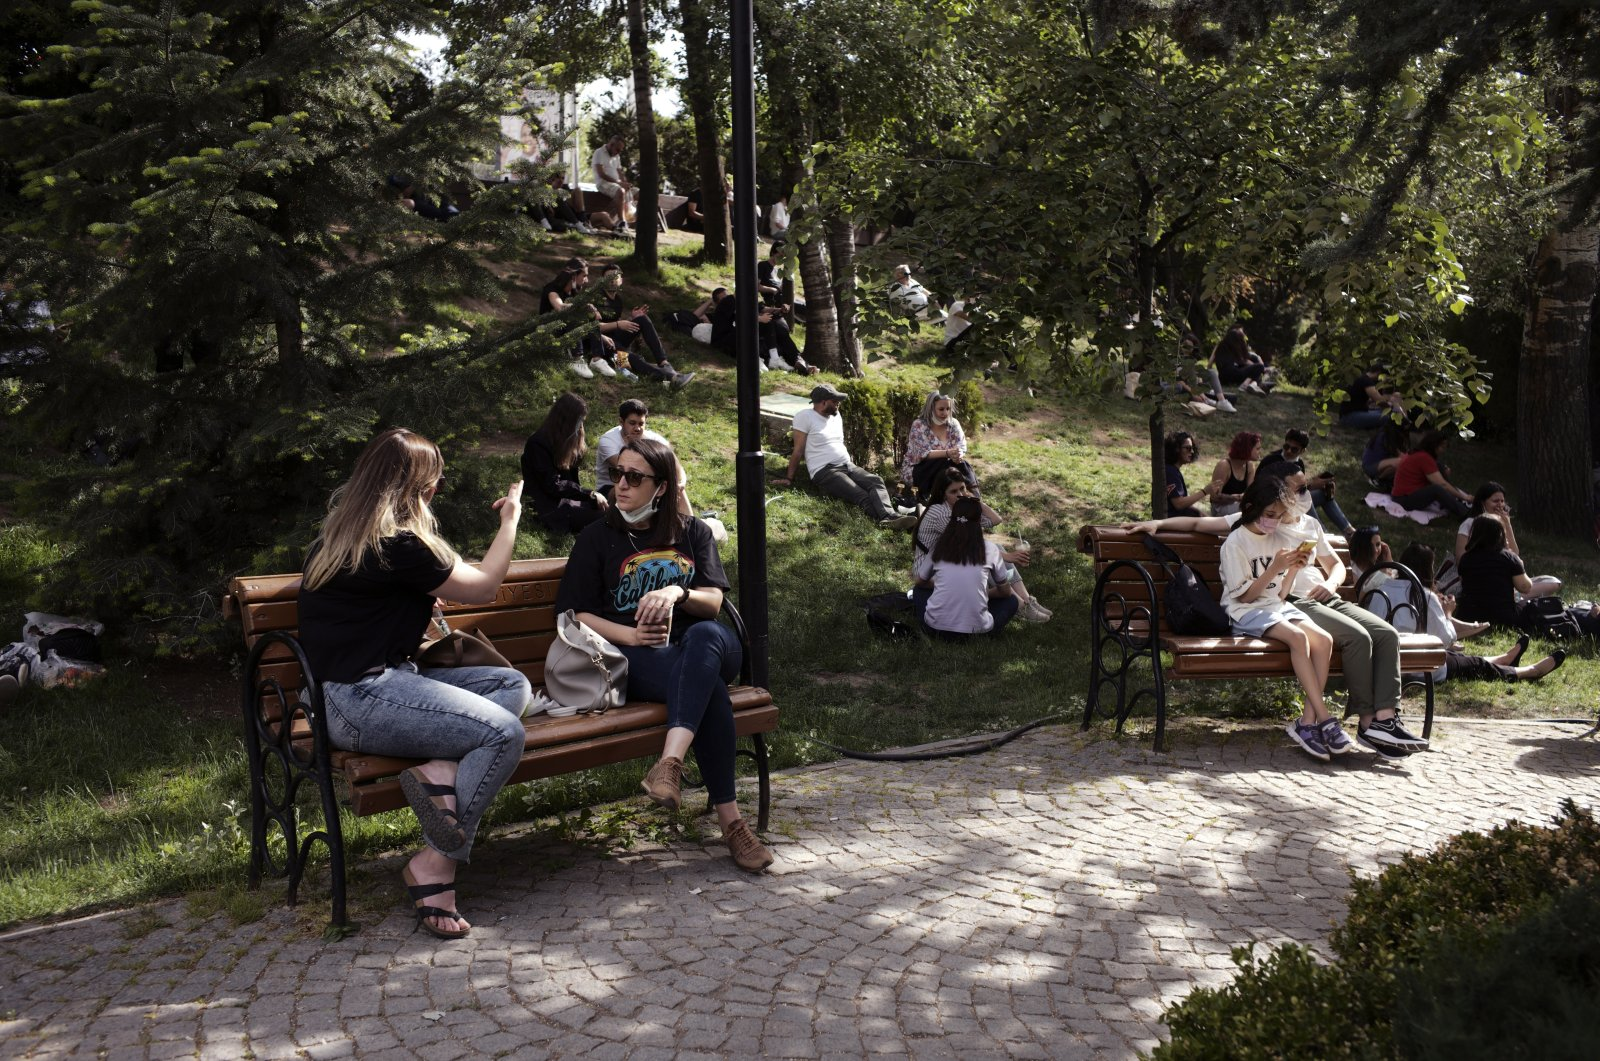 People crowd a public garden hours before a weekend curfew, in Ankara, Turkey, Friday, May 21, 2021. (AP Photo)